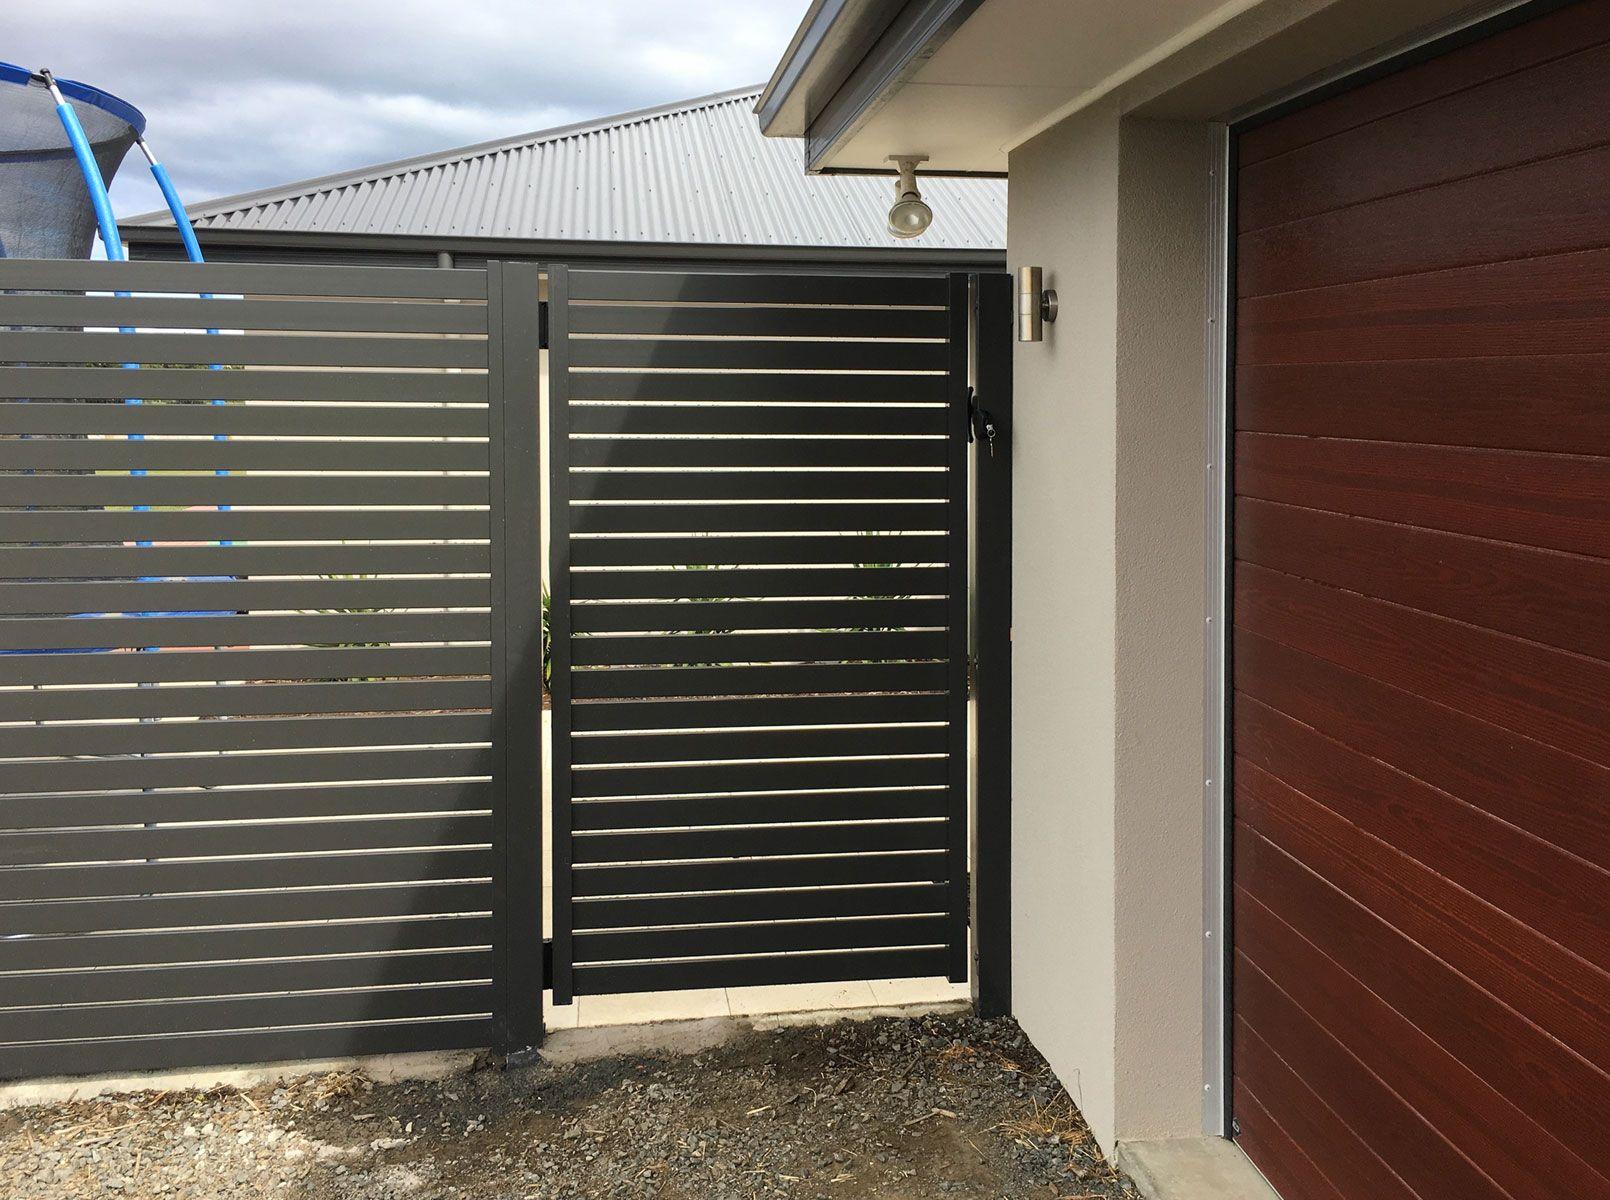 Ezi Slat Fencing Stratco Front Gate Design Gate Design Aluminium Gates